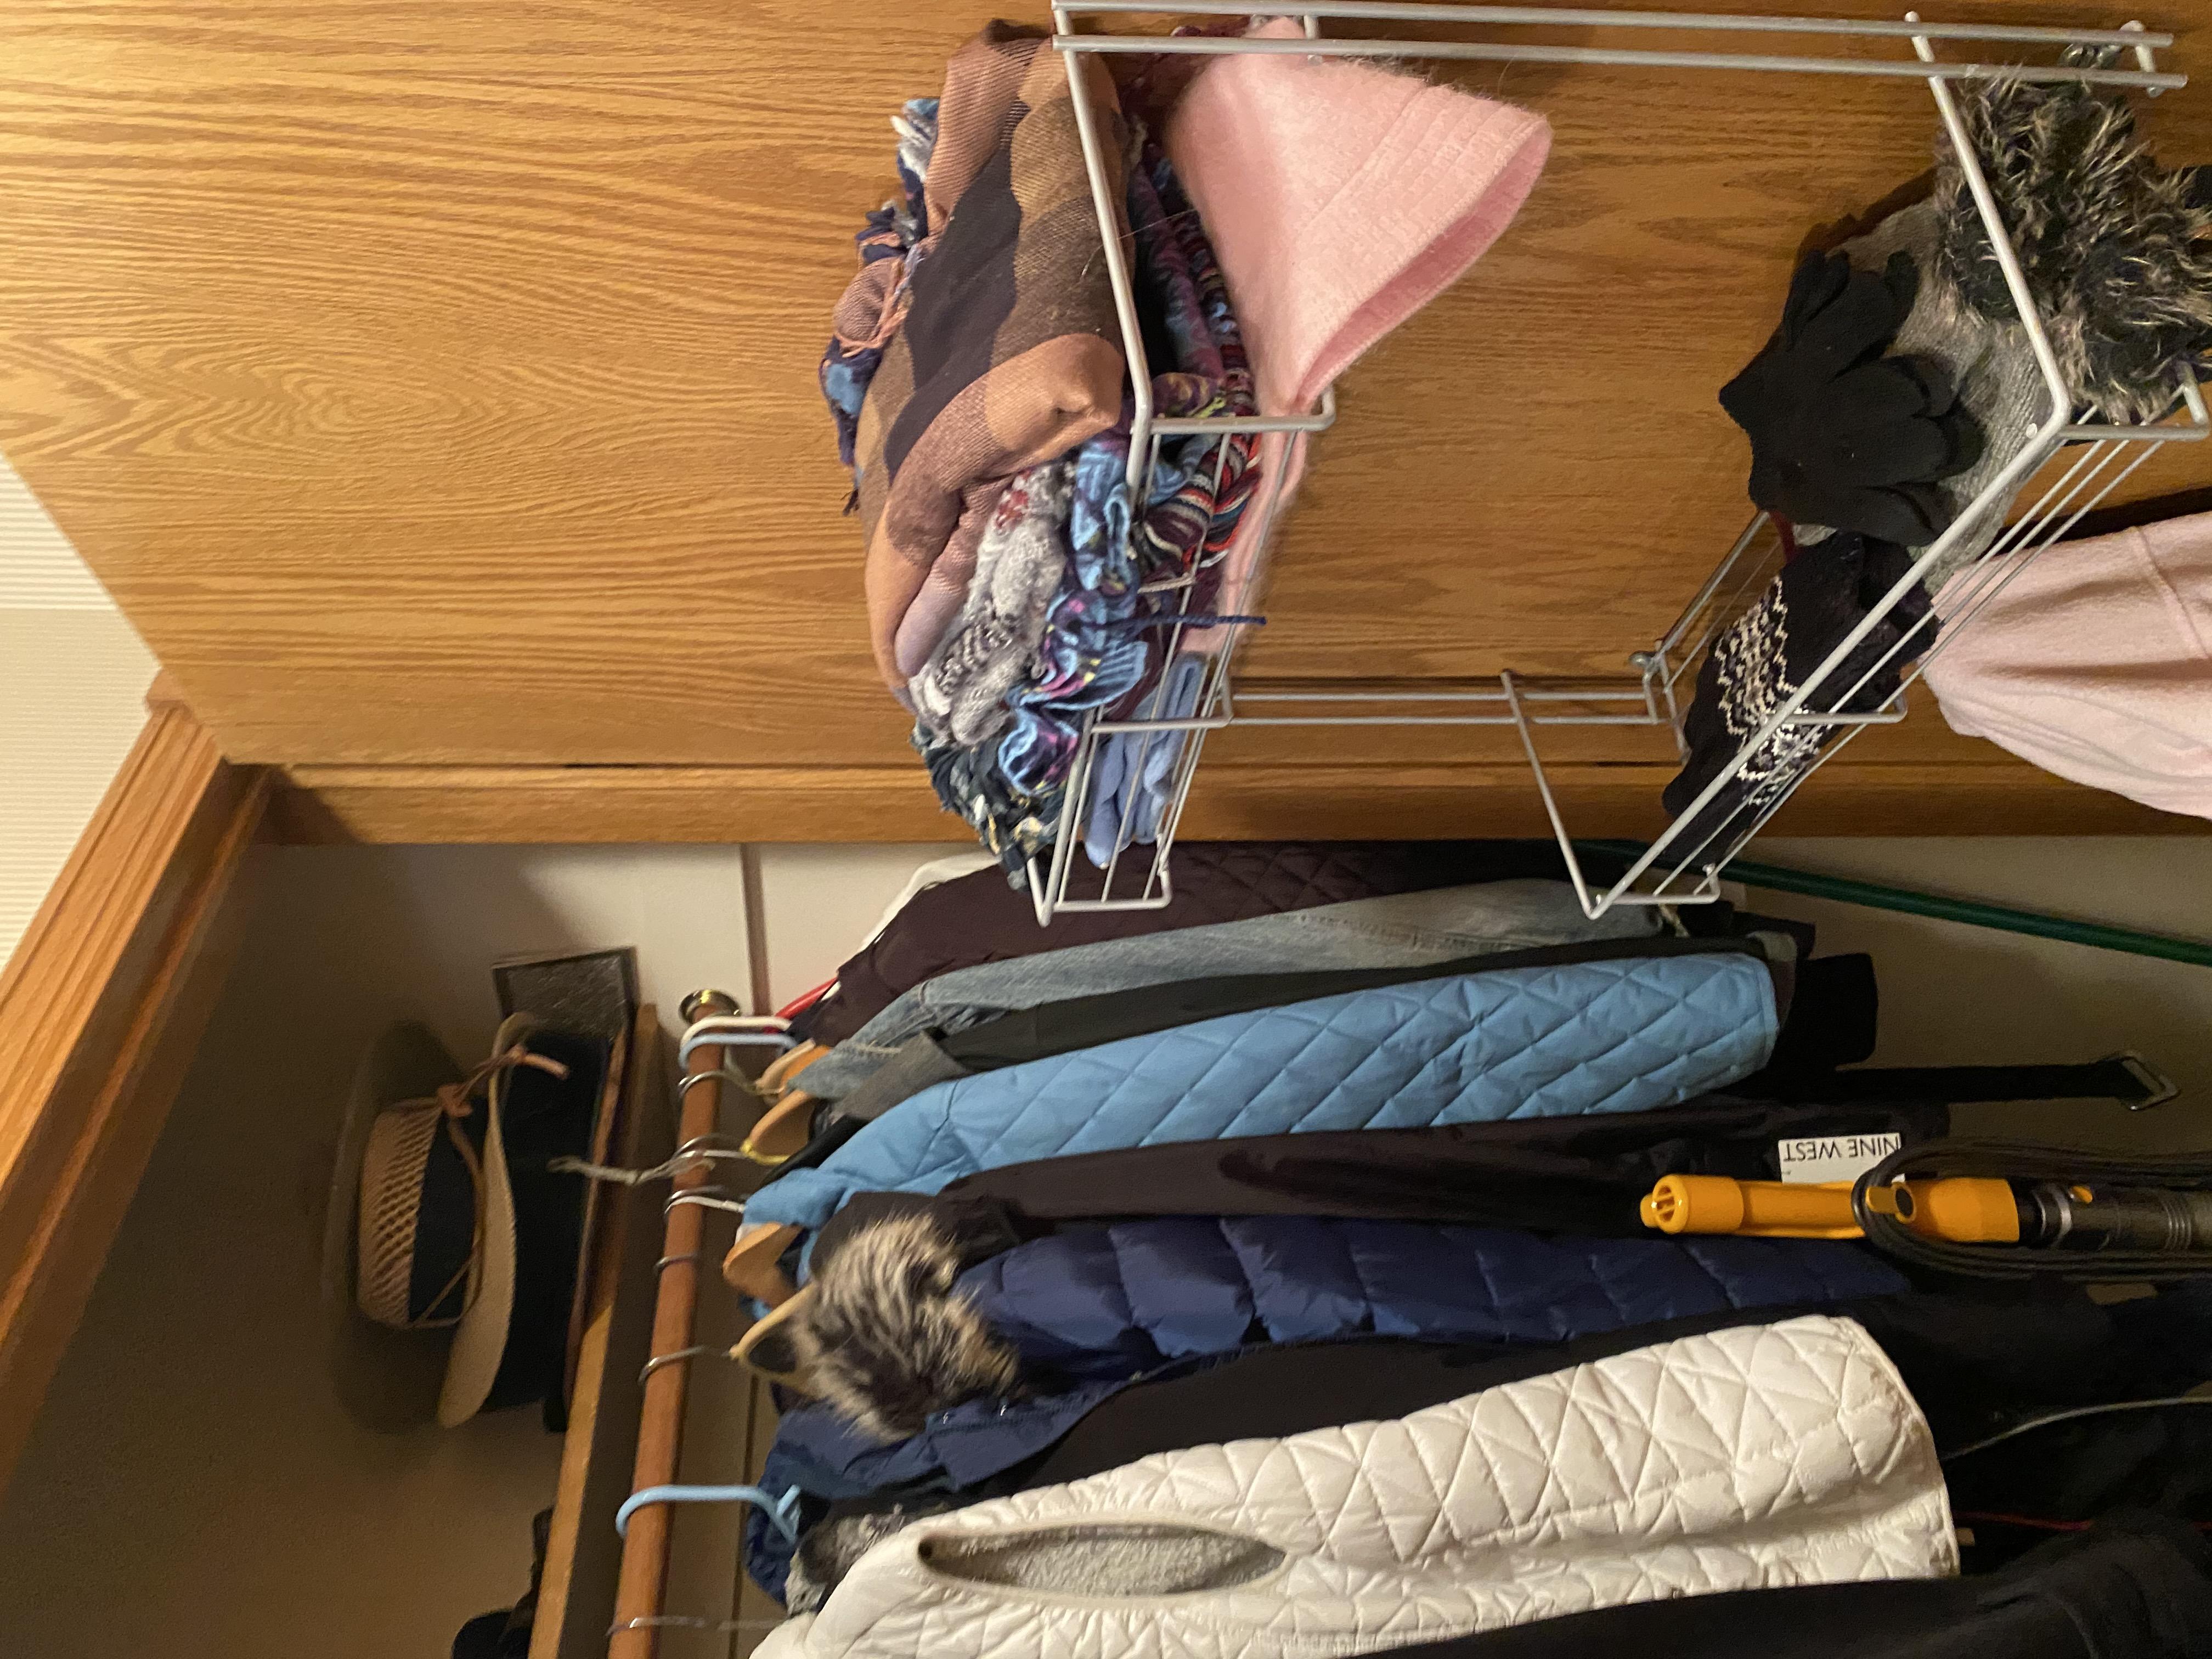 2058 HIllside Ave Mondamin closet2